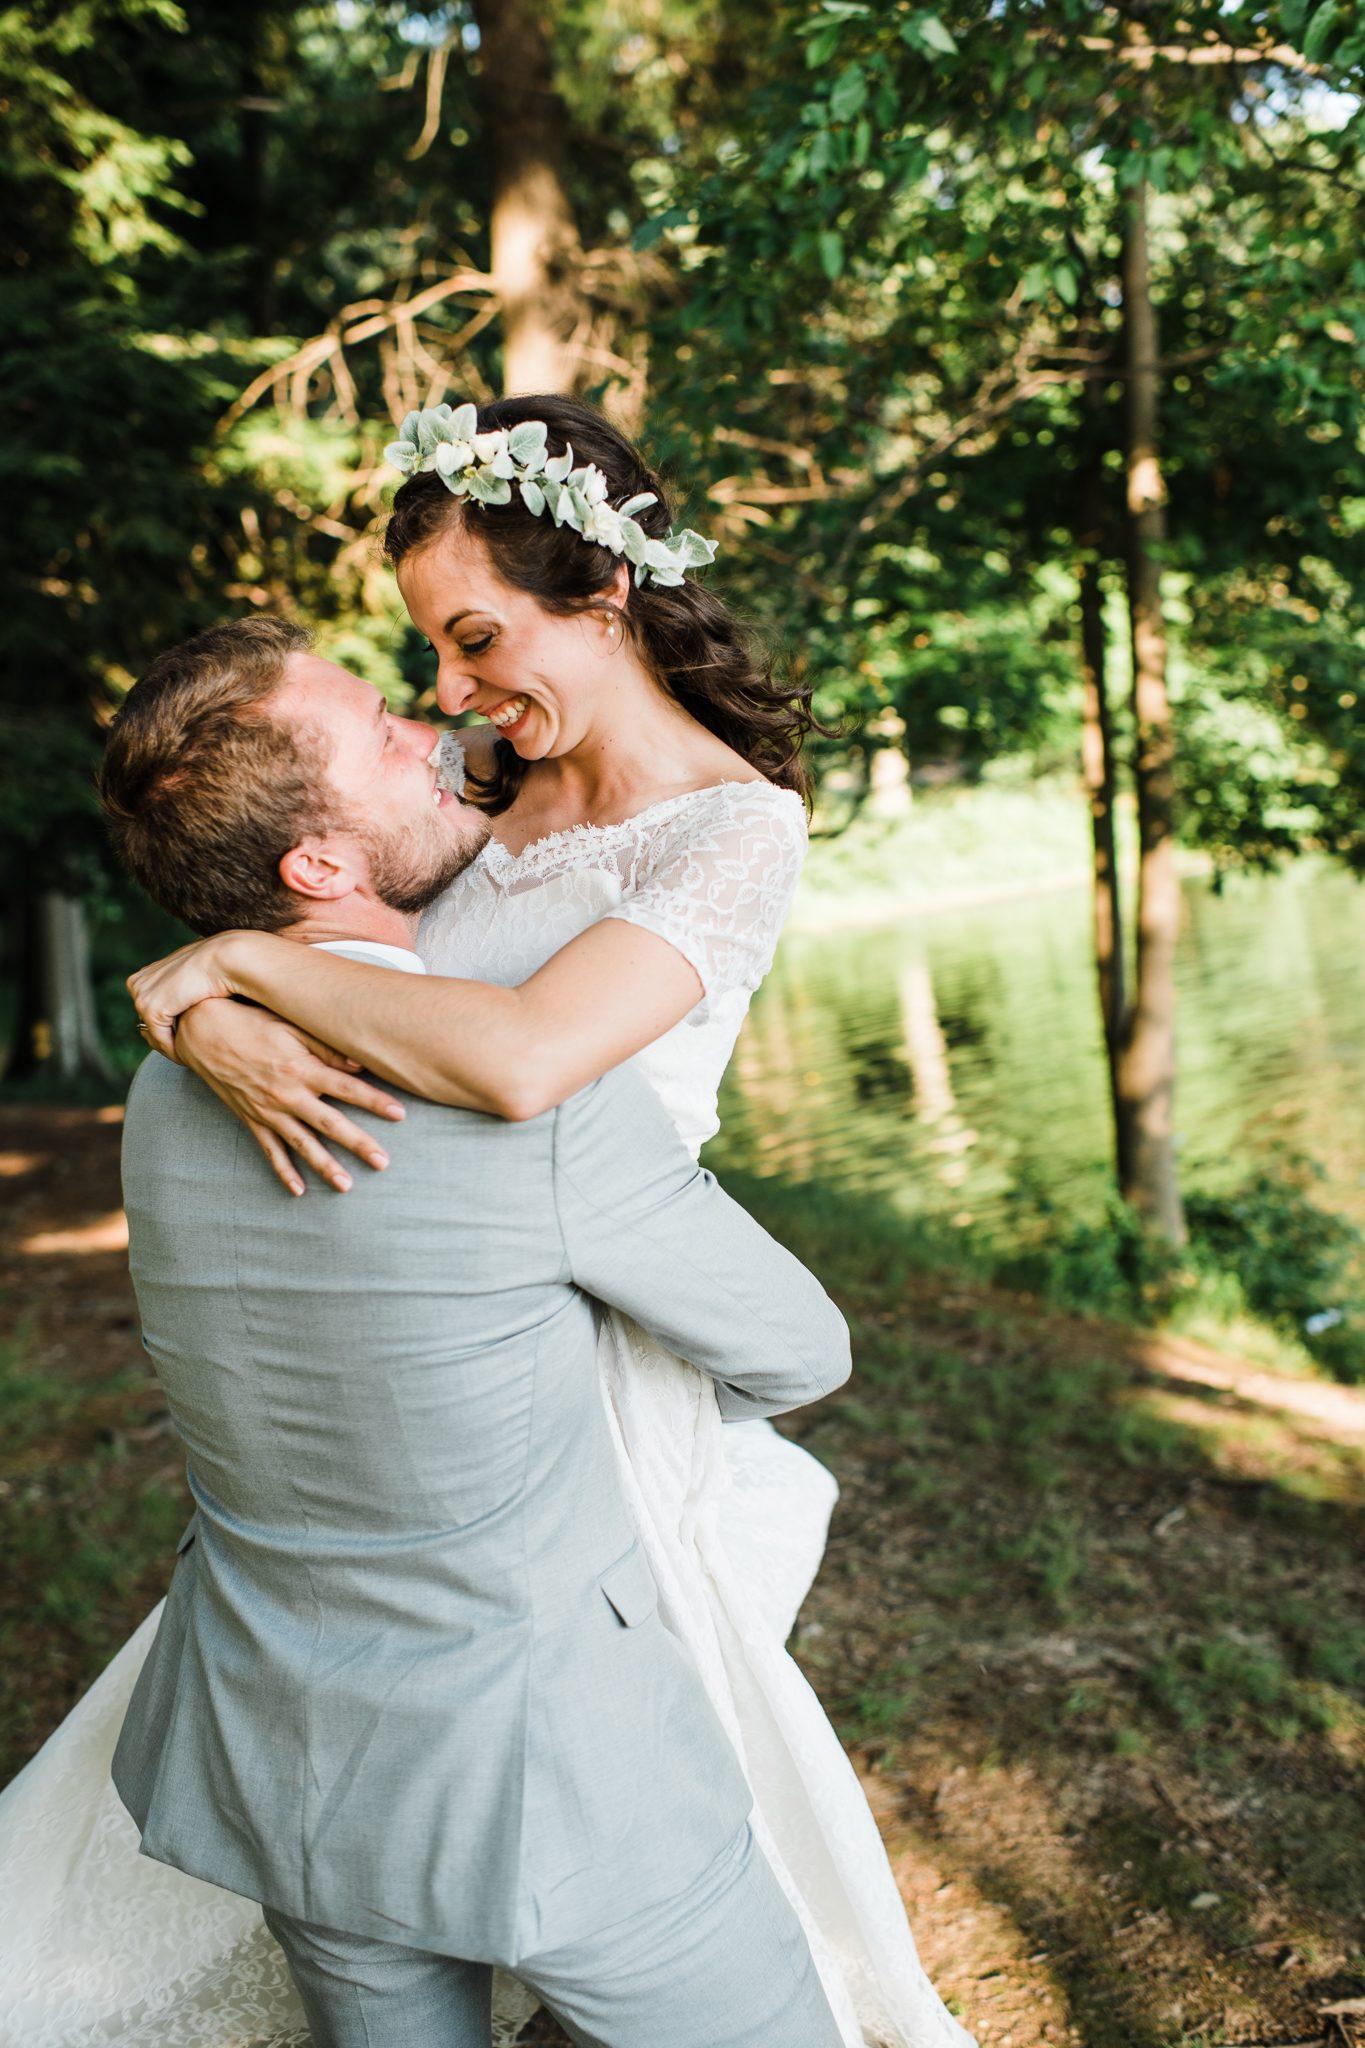 Easterday Creative   Adventurous wedding photographer and storyteller   Serving NC, SC and beyond!